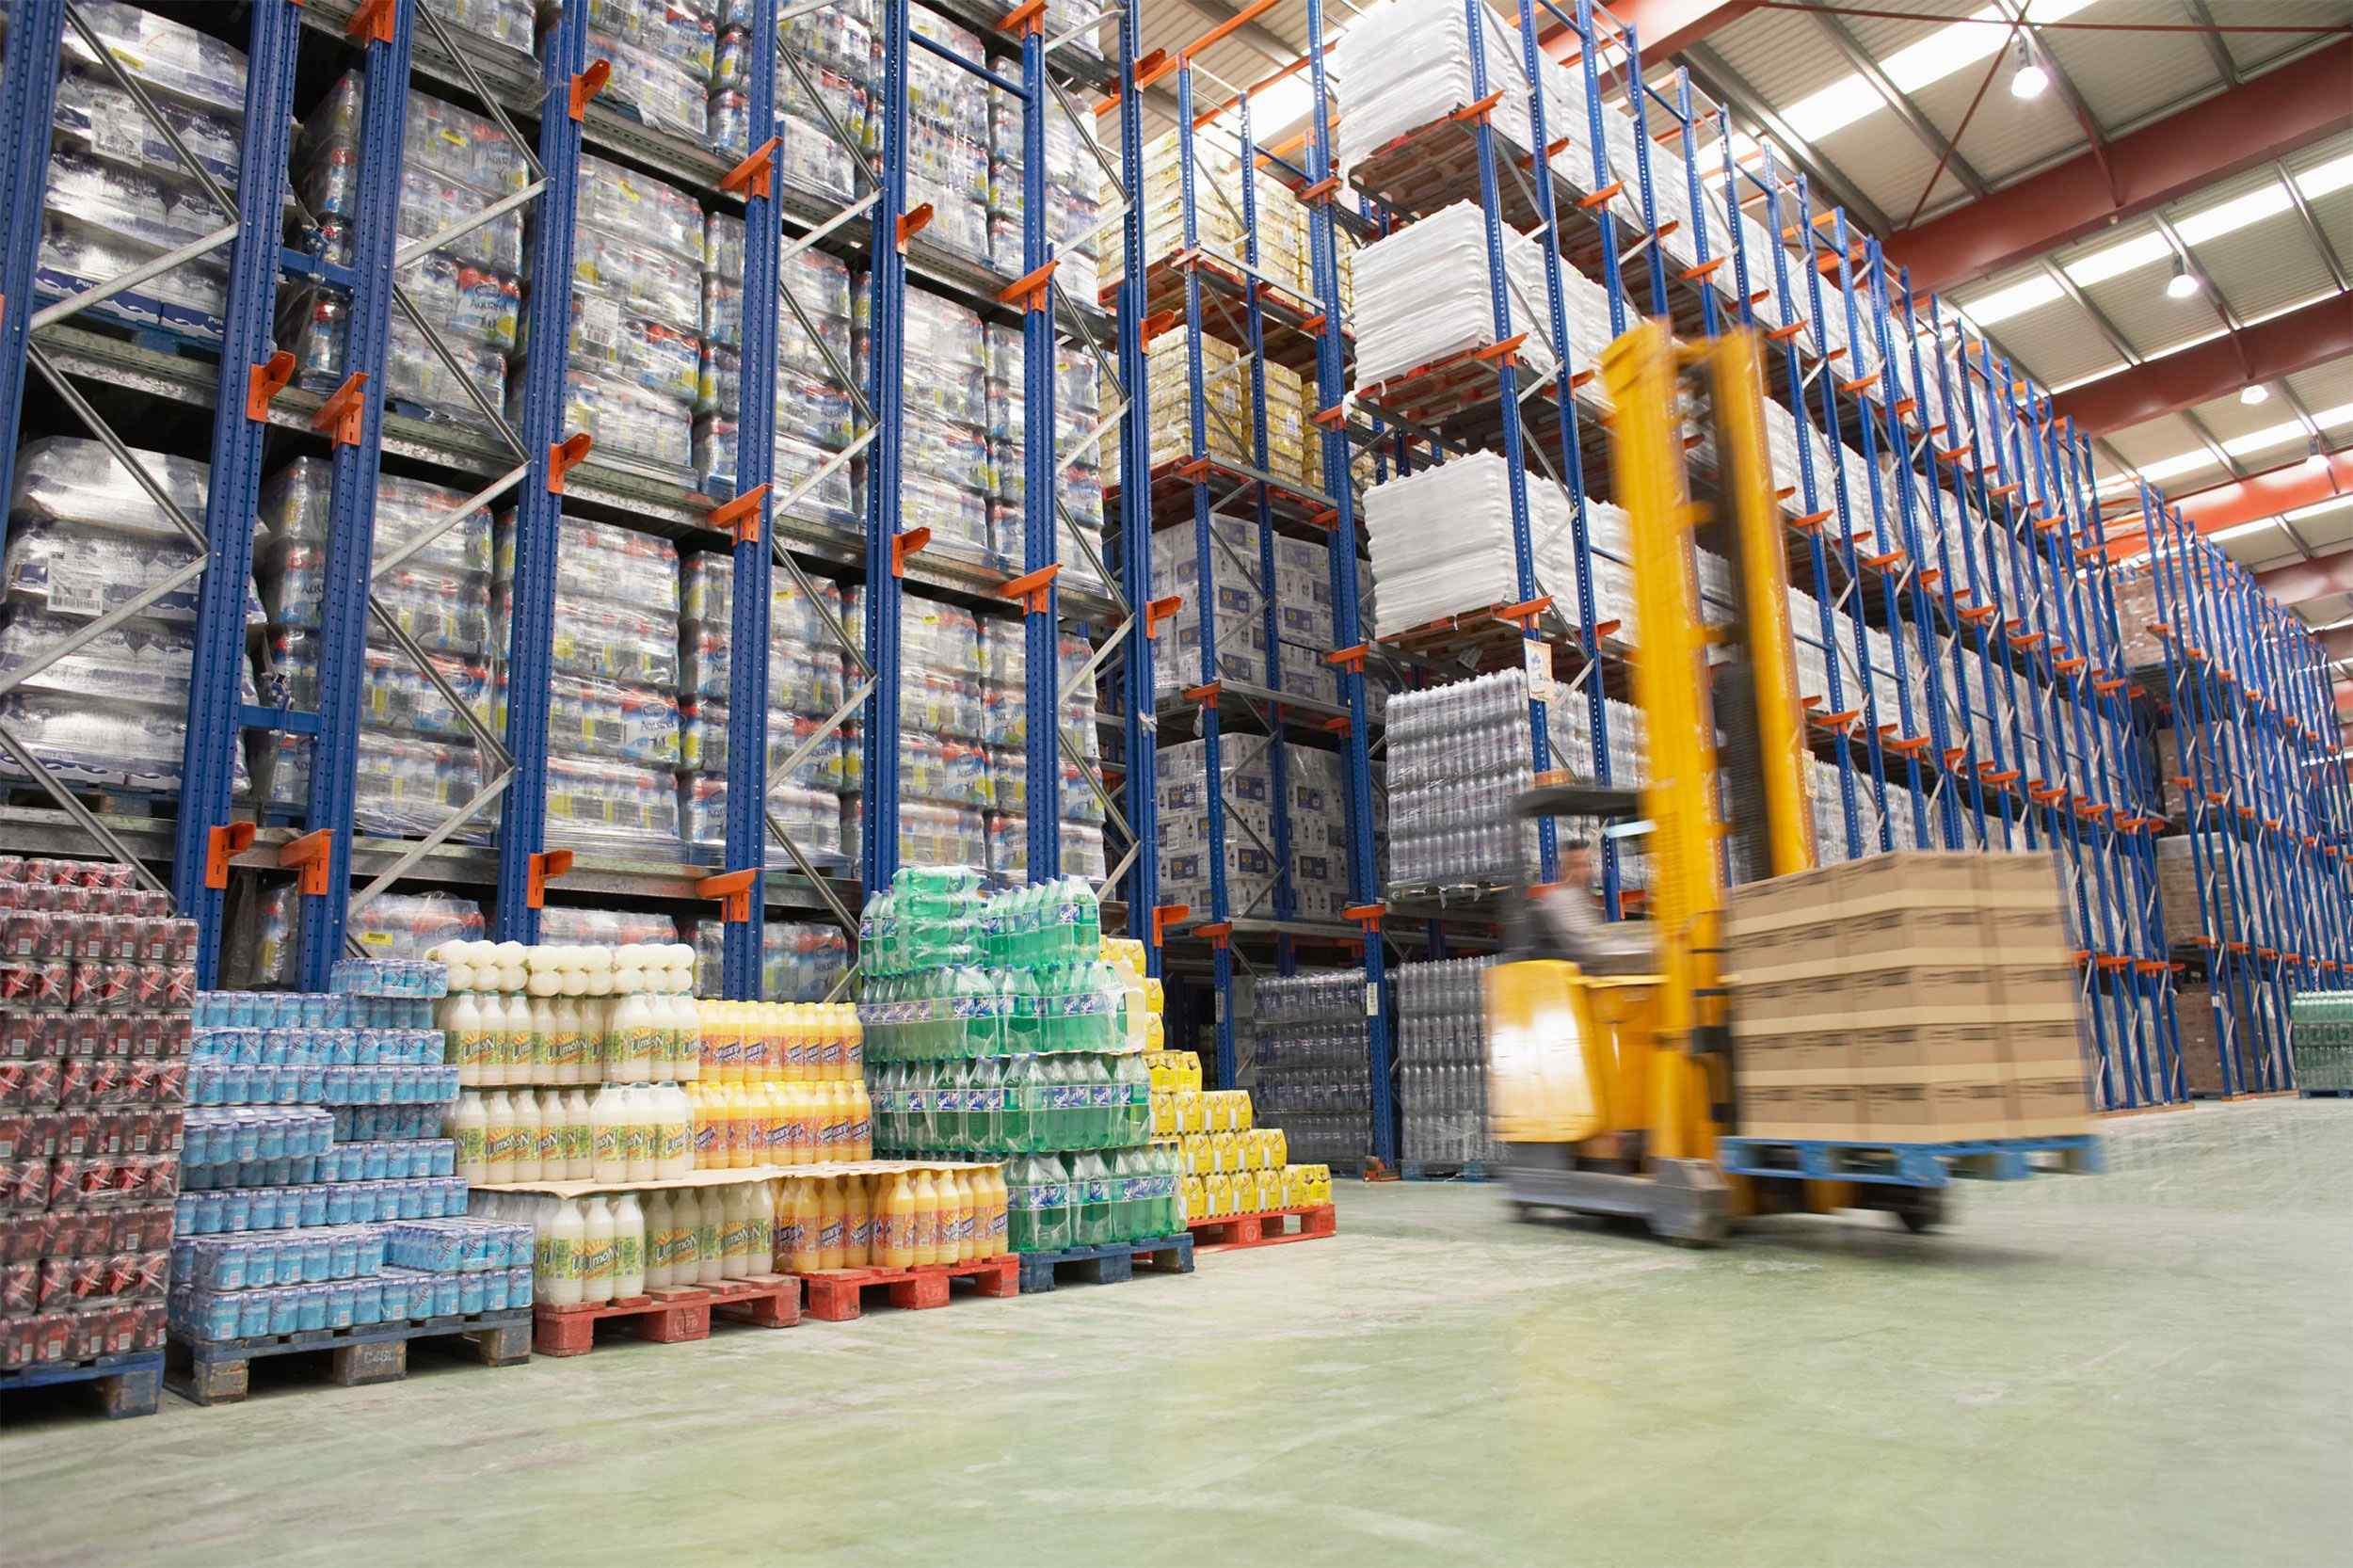 https://cobe-transport-logistics.com/wp-content/uploads/2015/09/Warehouse-and-lifter.jpg